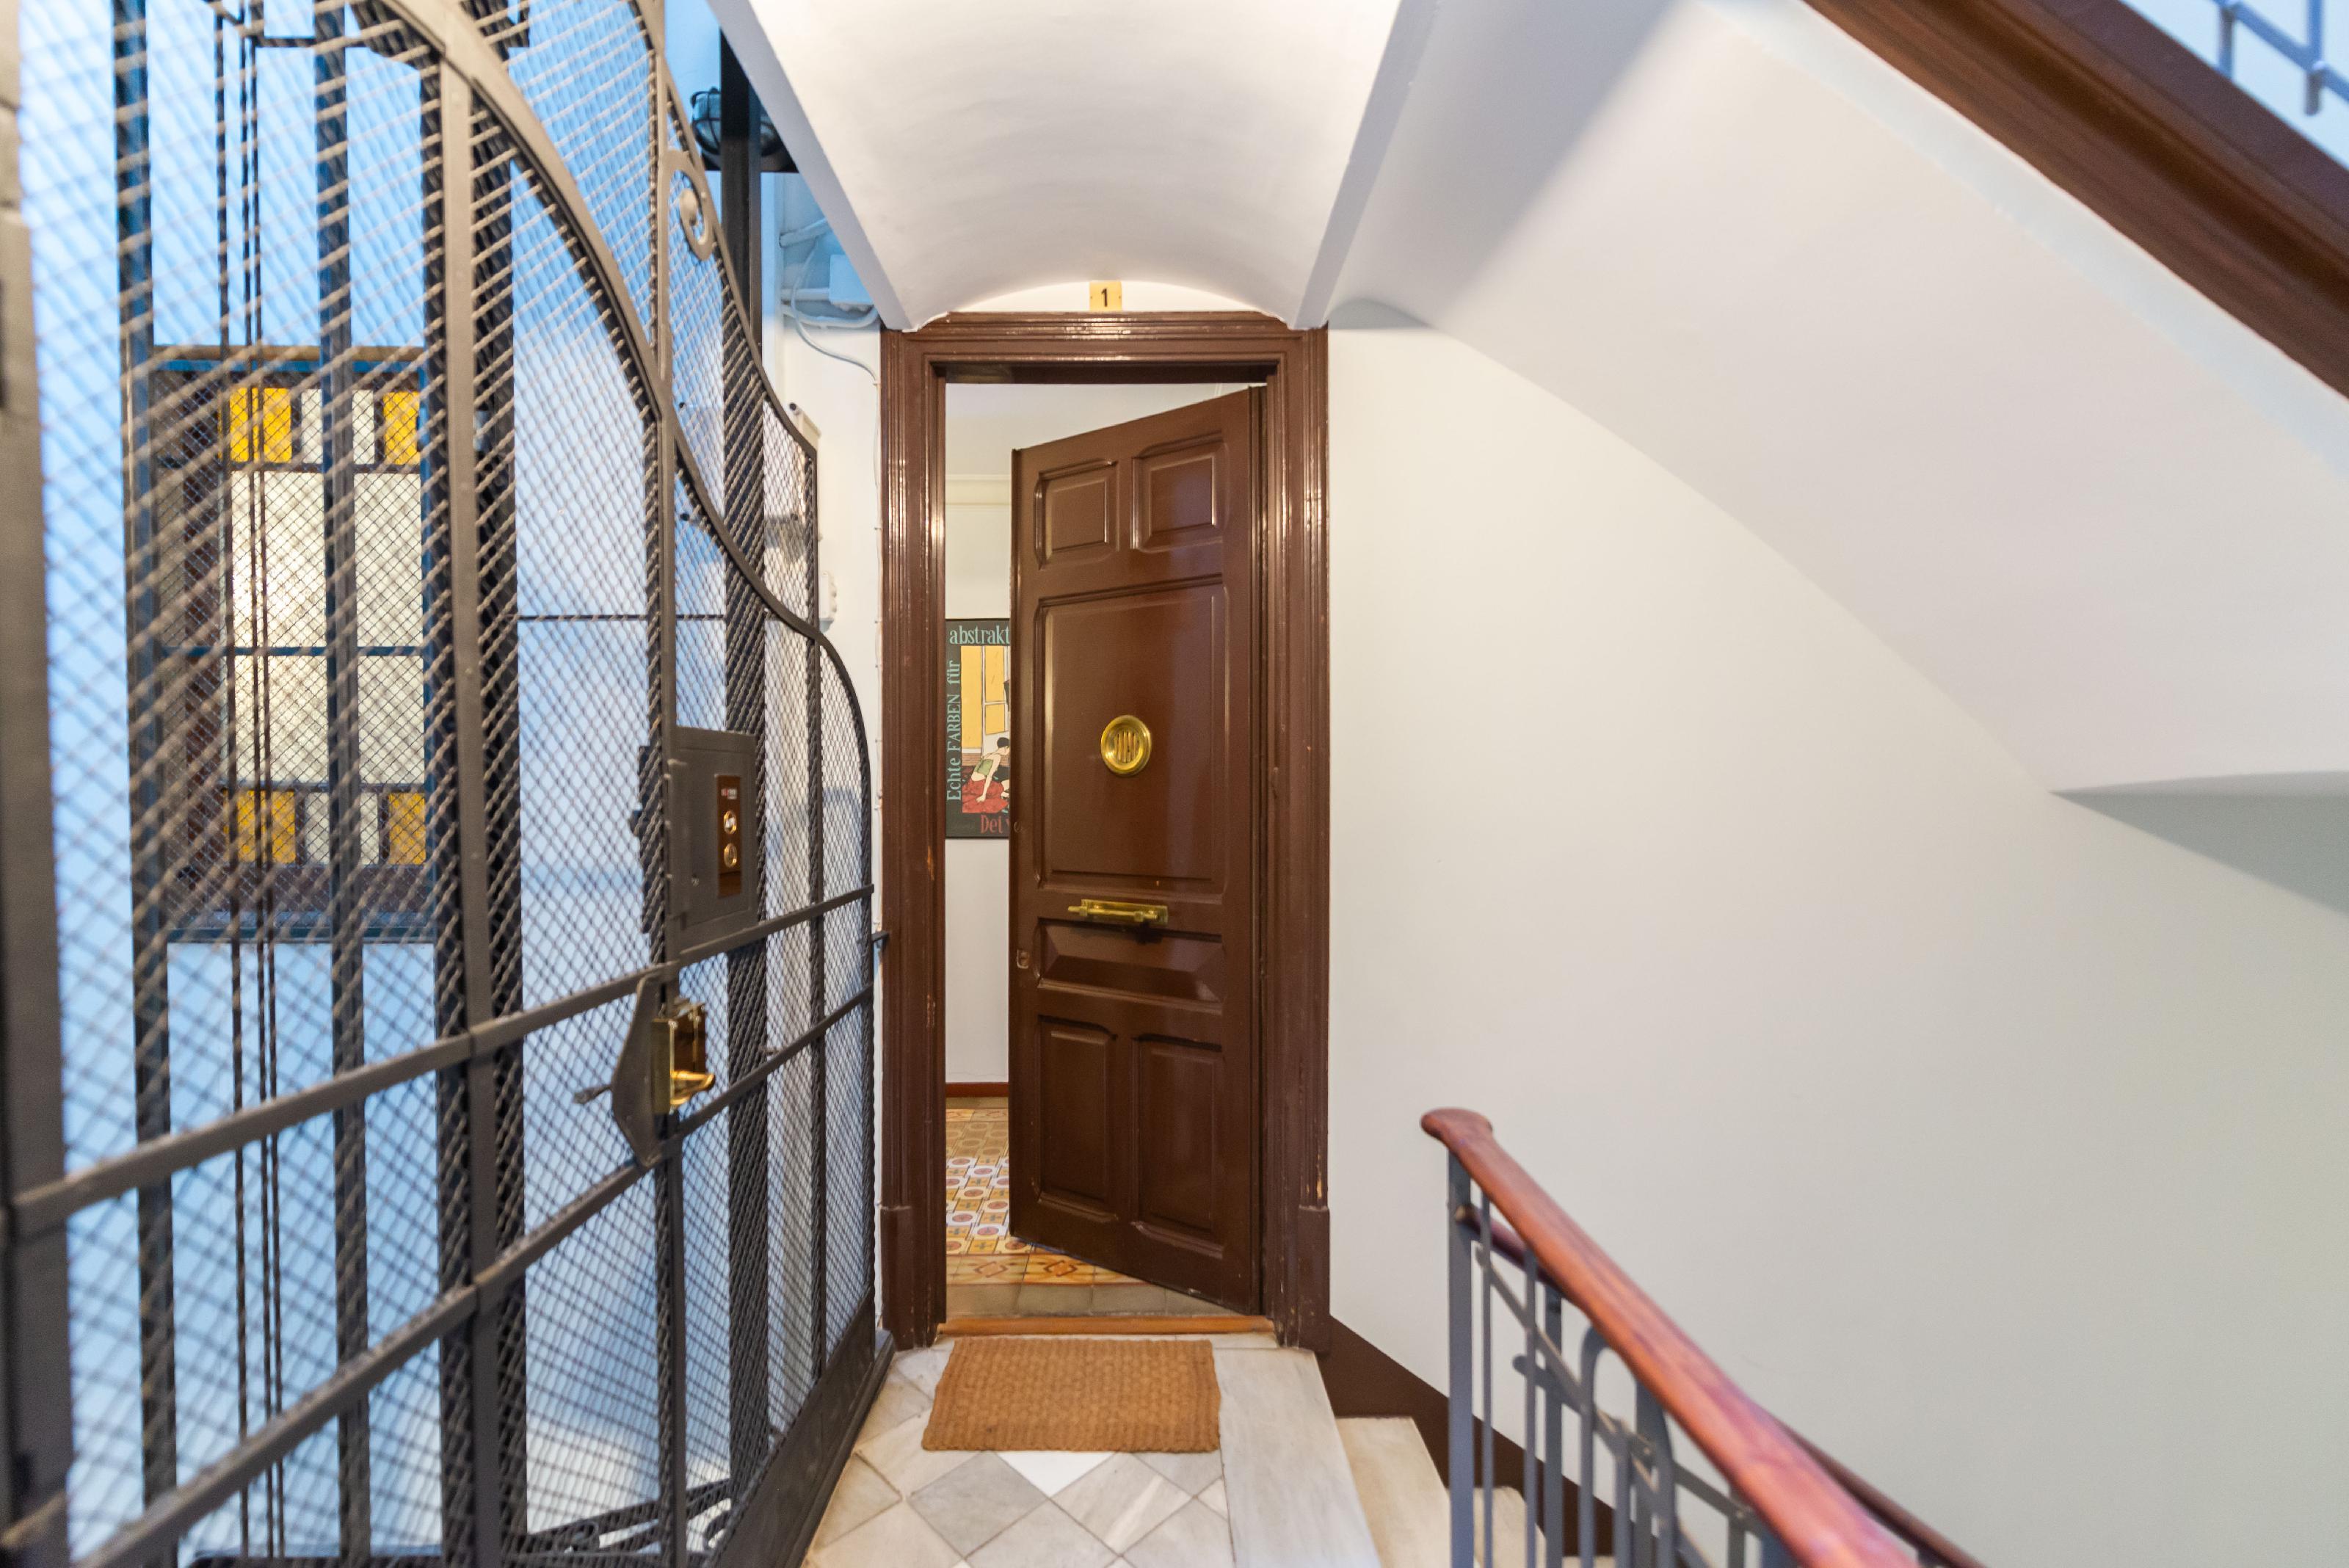 250582 Flat for sale in Sarrià-Sant Gervasi, Sant Gervasi-Galvany 26